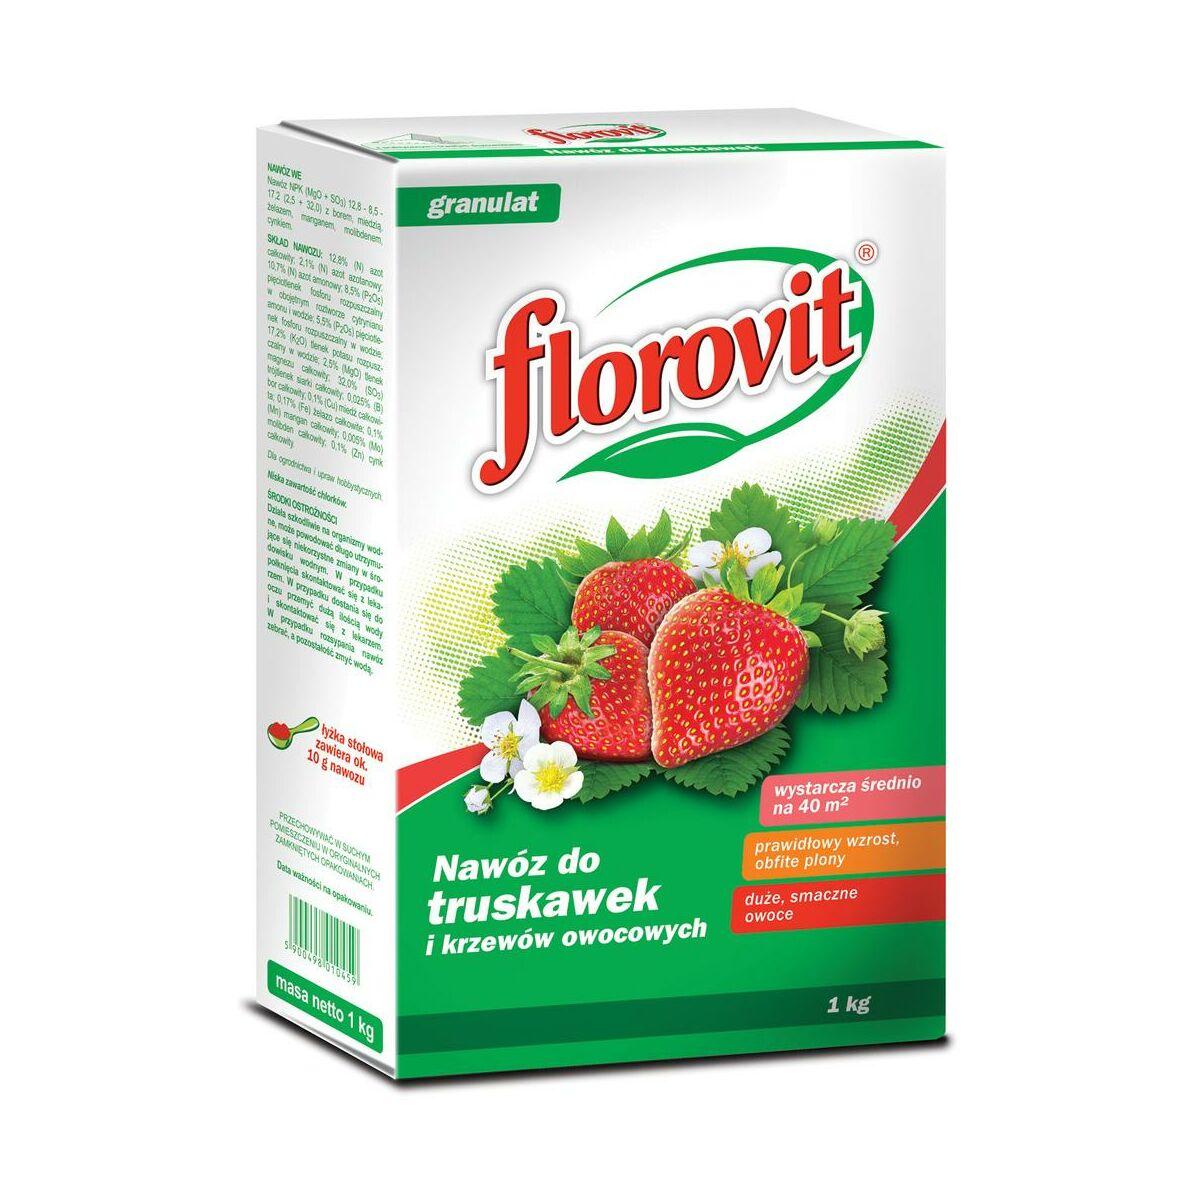 Nawóz do truskawek 1 kg FLOROVIT